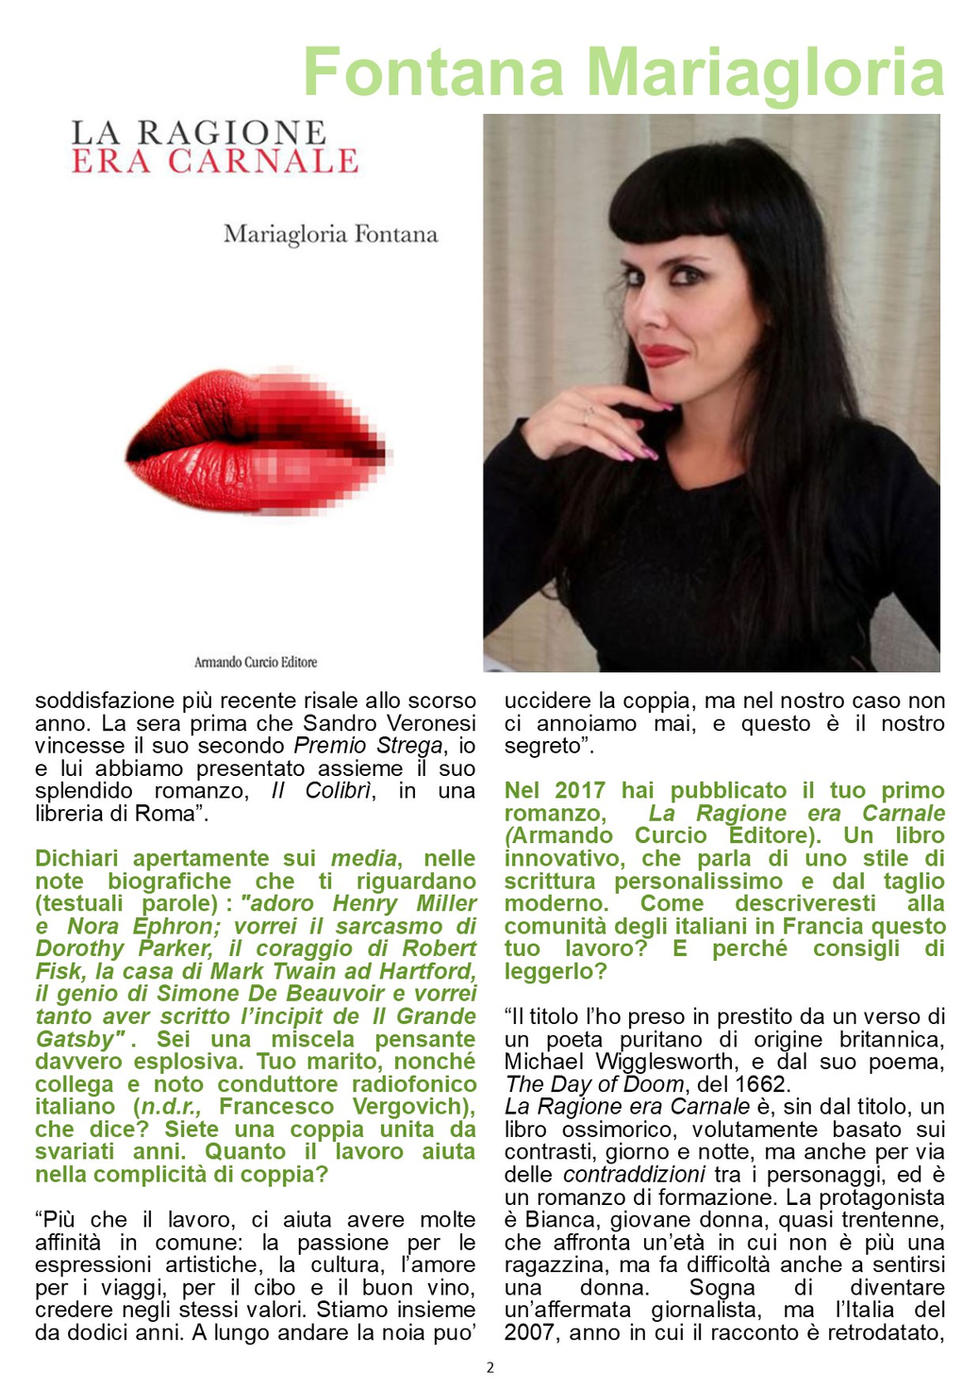 art FONTANA 2  Mariagloria 18052021.jpg